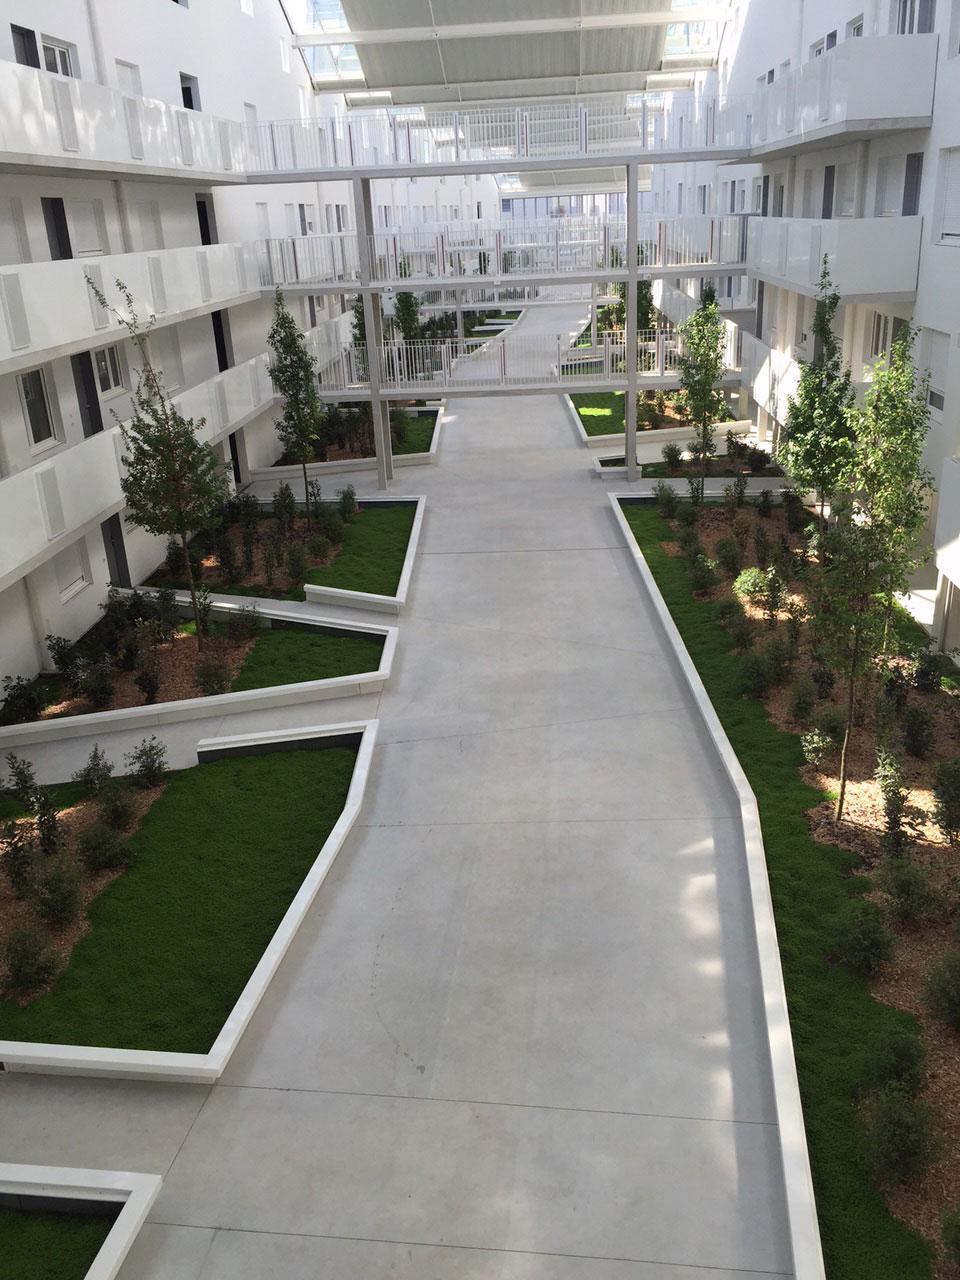 Eurochap galerie r alisations gironde aquitaine for Dalle beton finition quartz